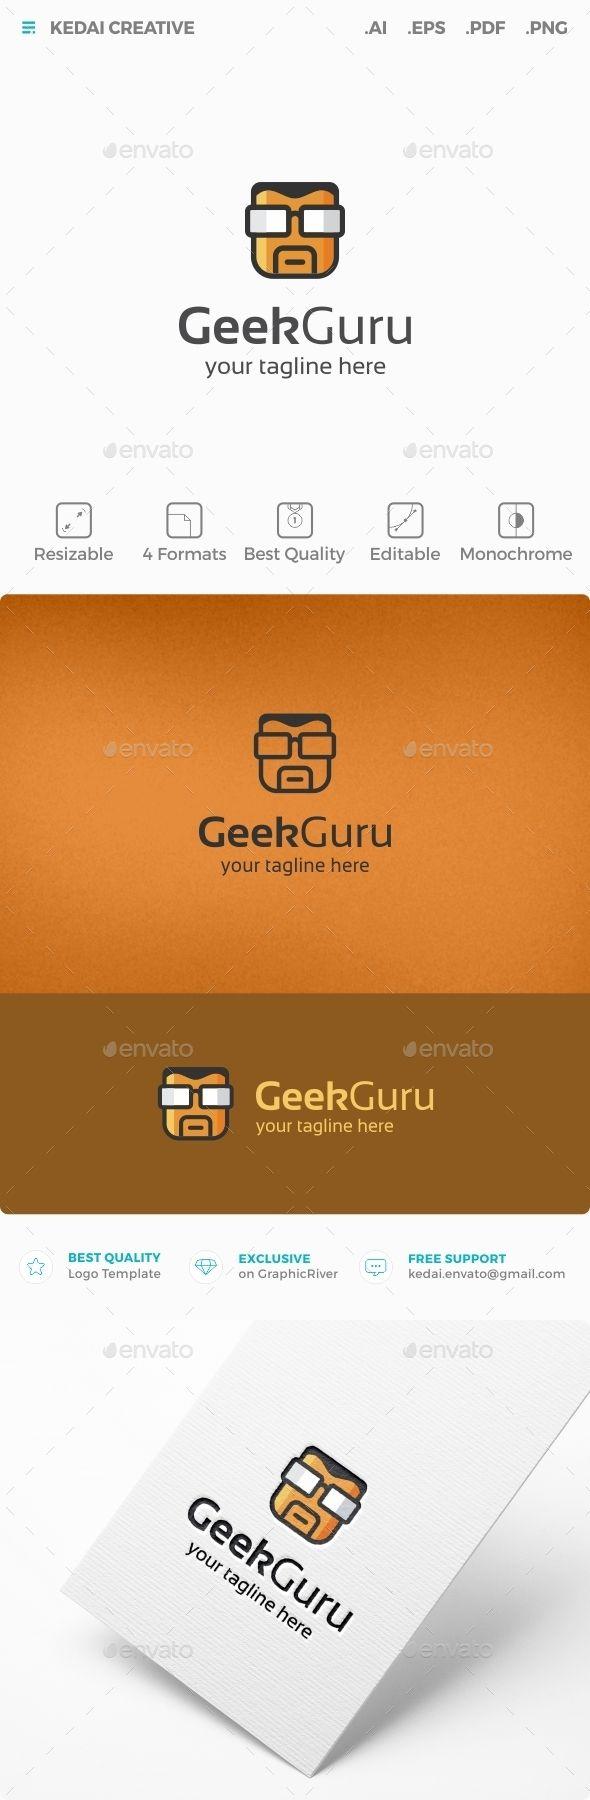 Tj initial luxury ornament monogram logo stock vector - Geek Guru